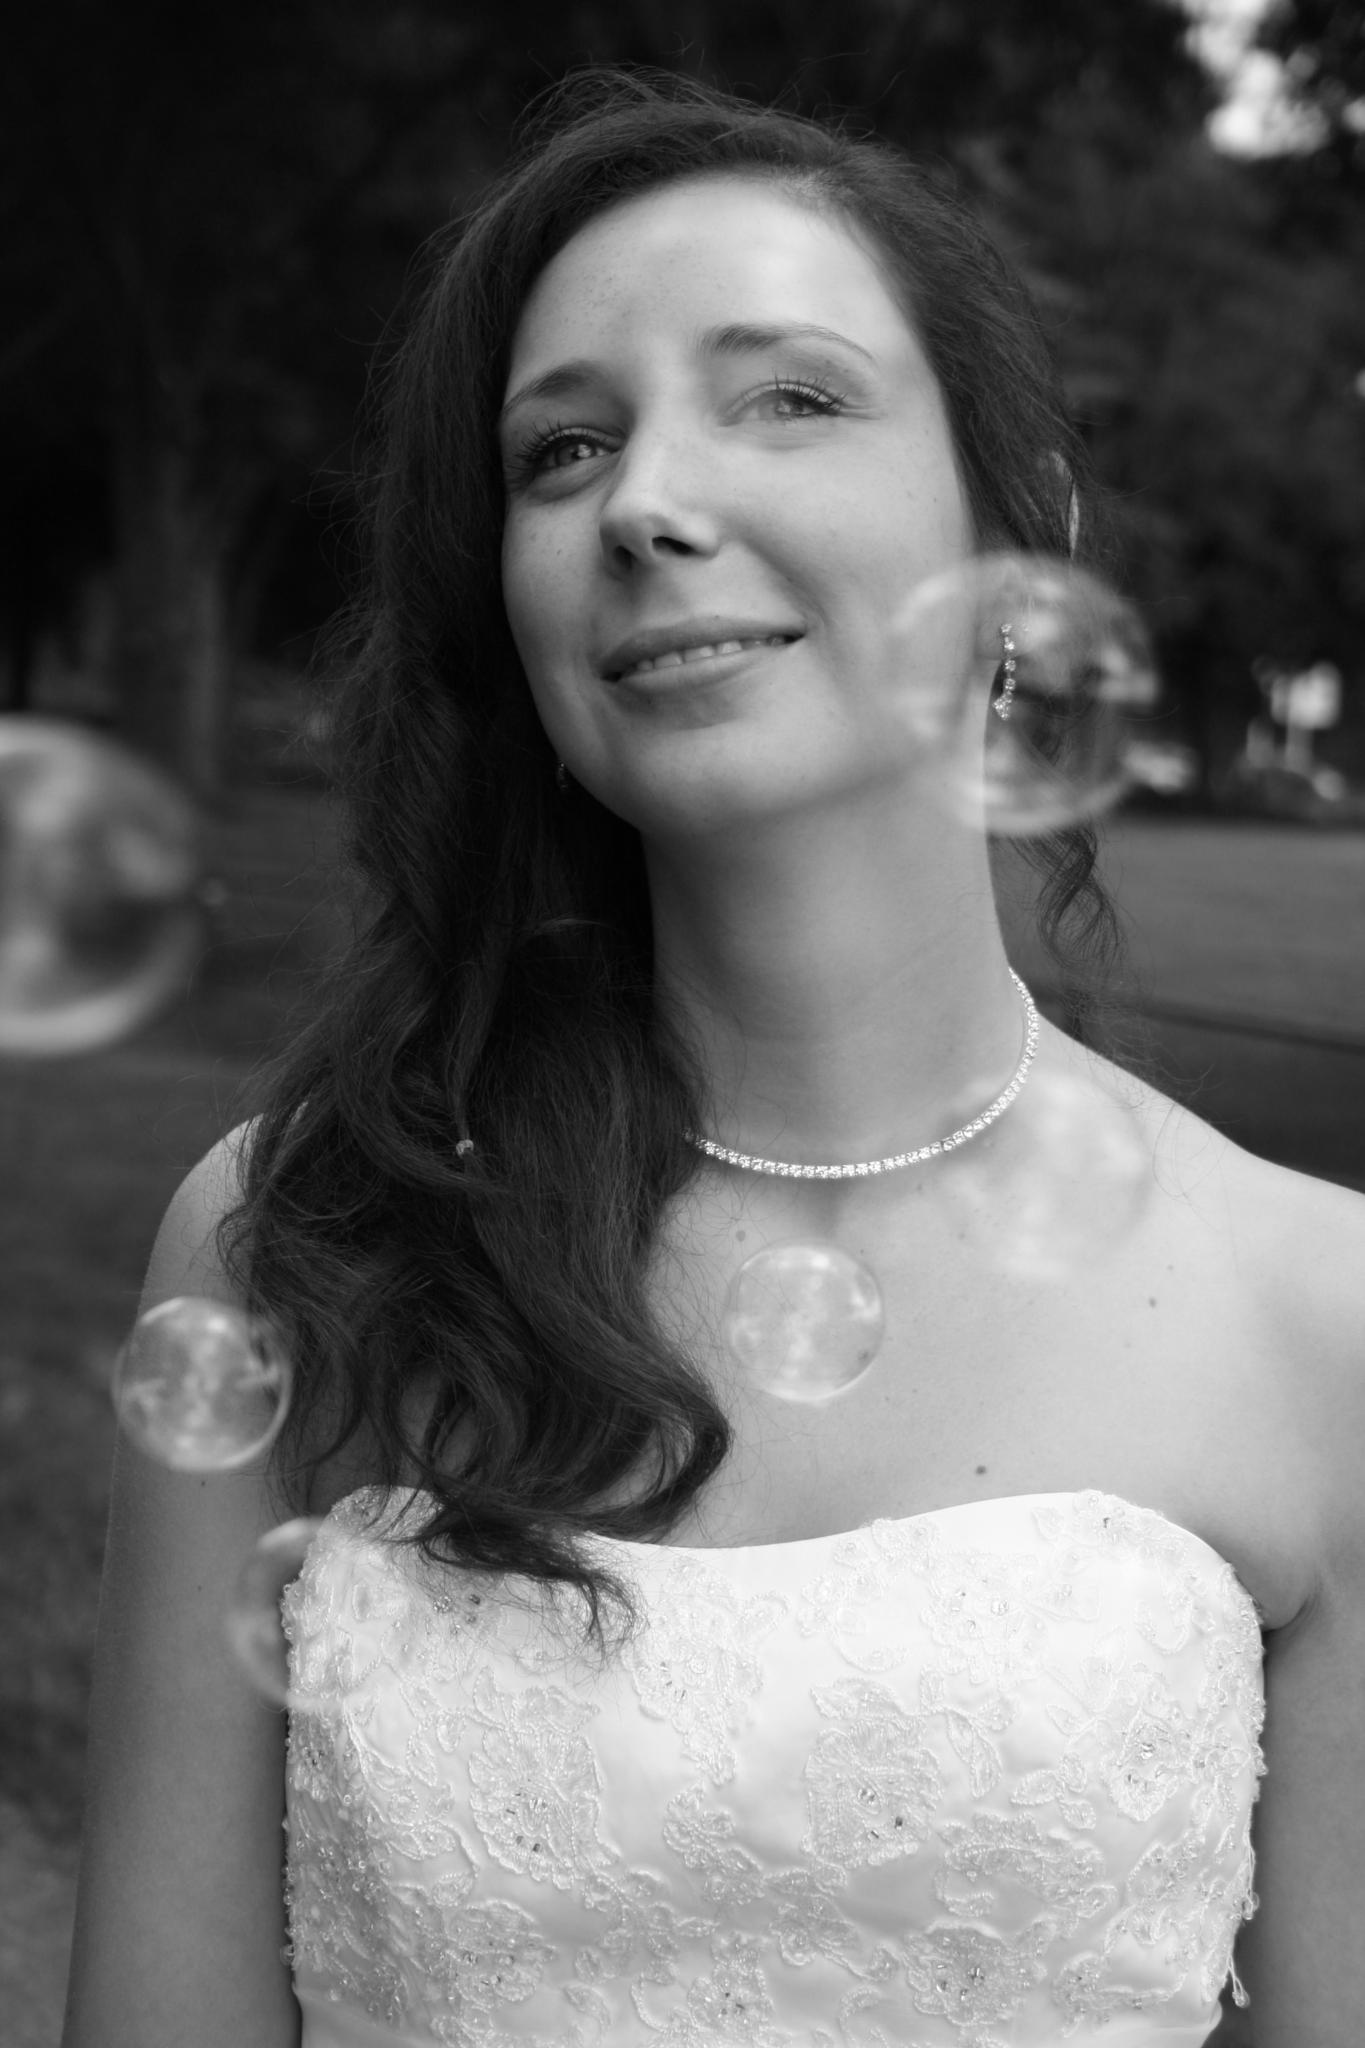 Wedding by felicia.vanmelsen